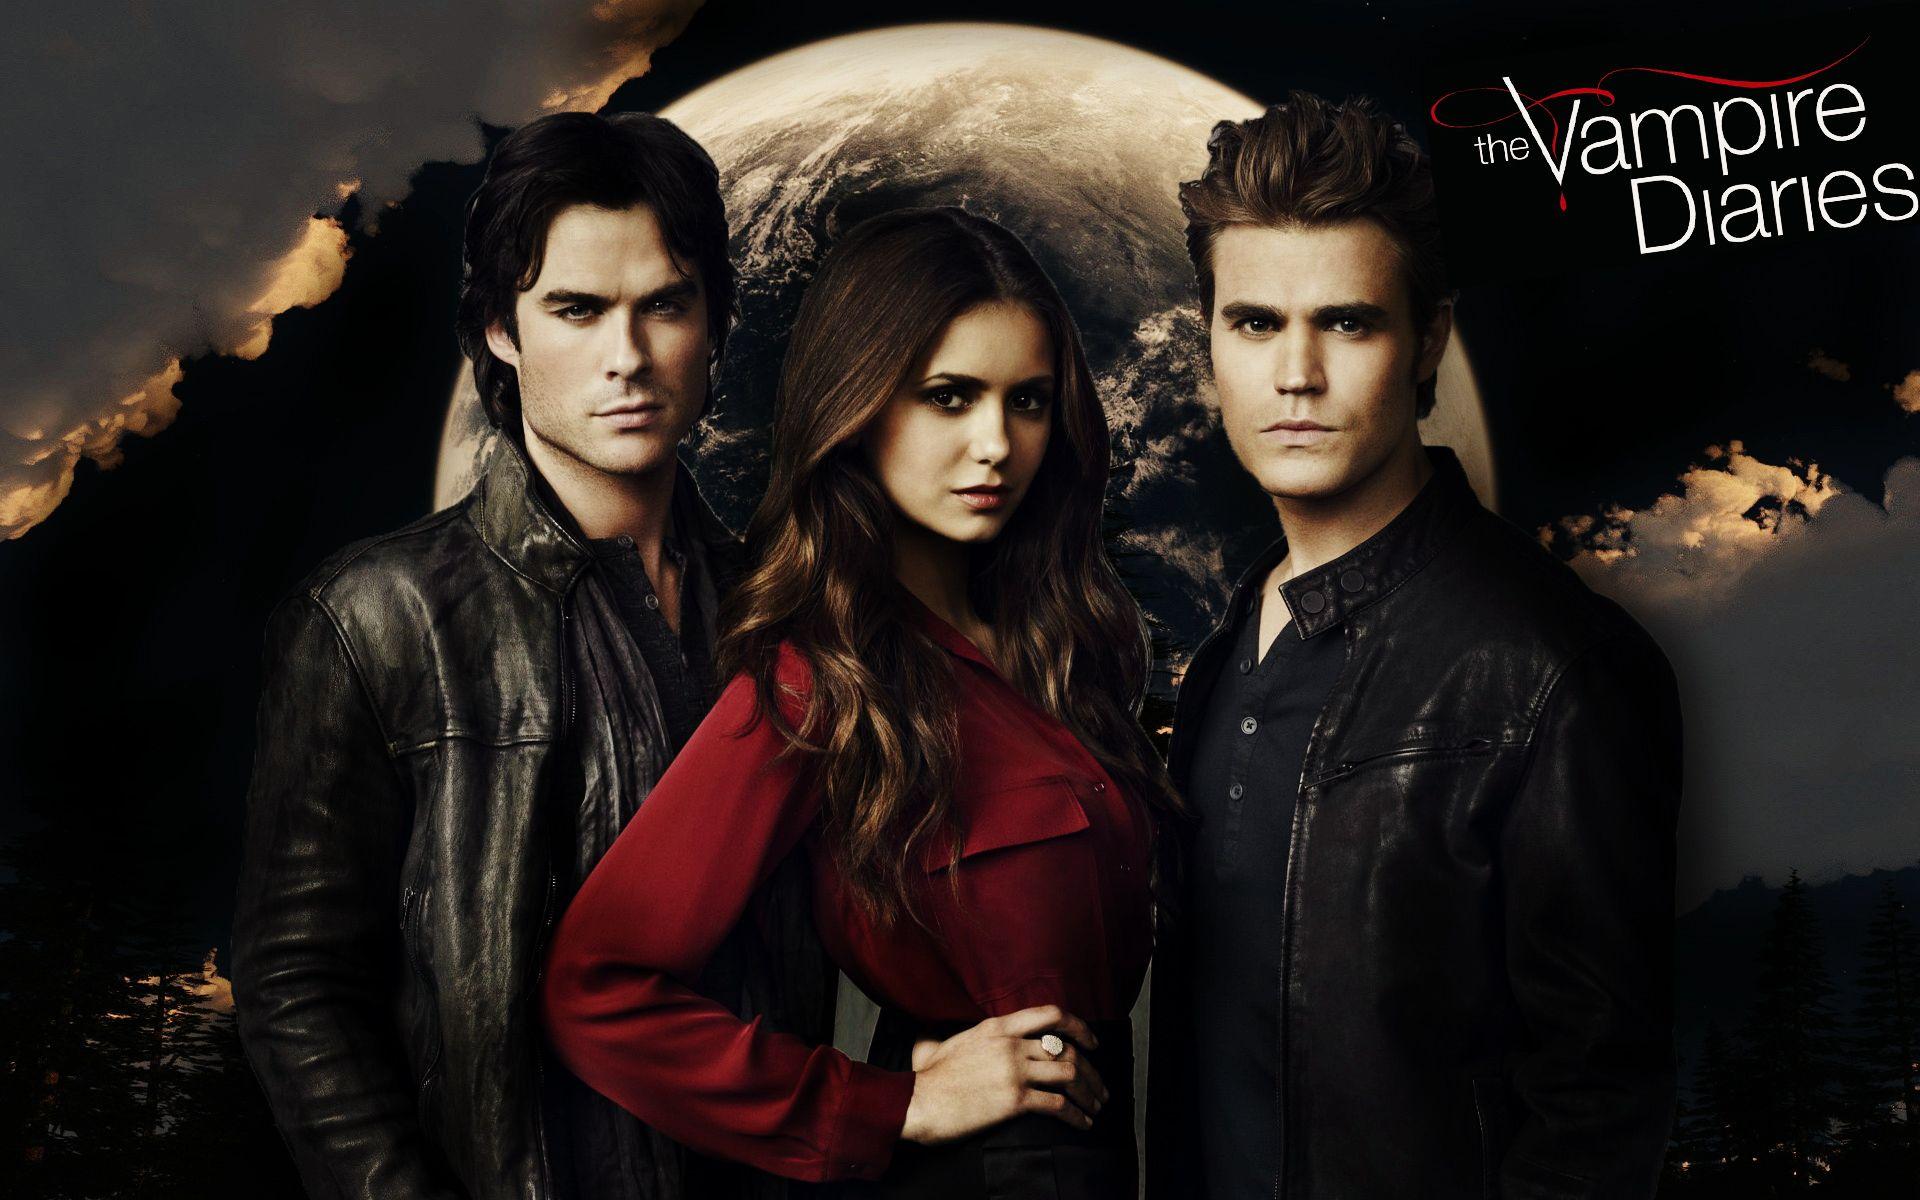 The Vampire Diaries Segunda Temporada Dublado